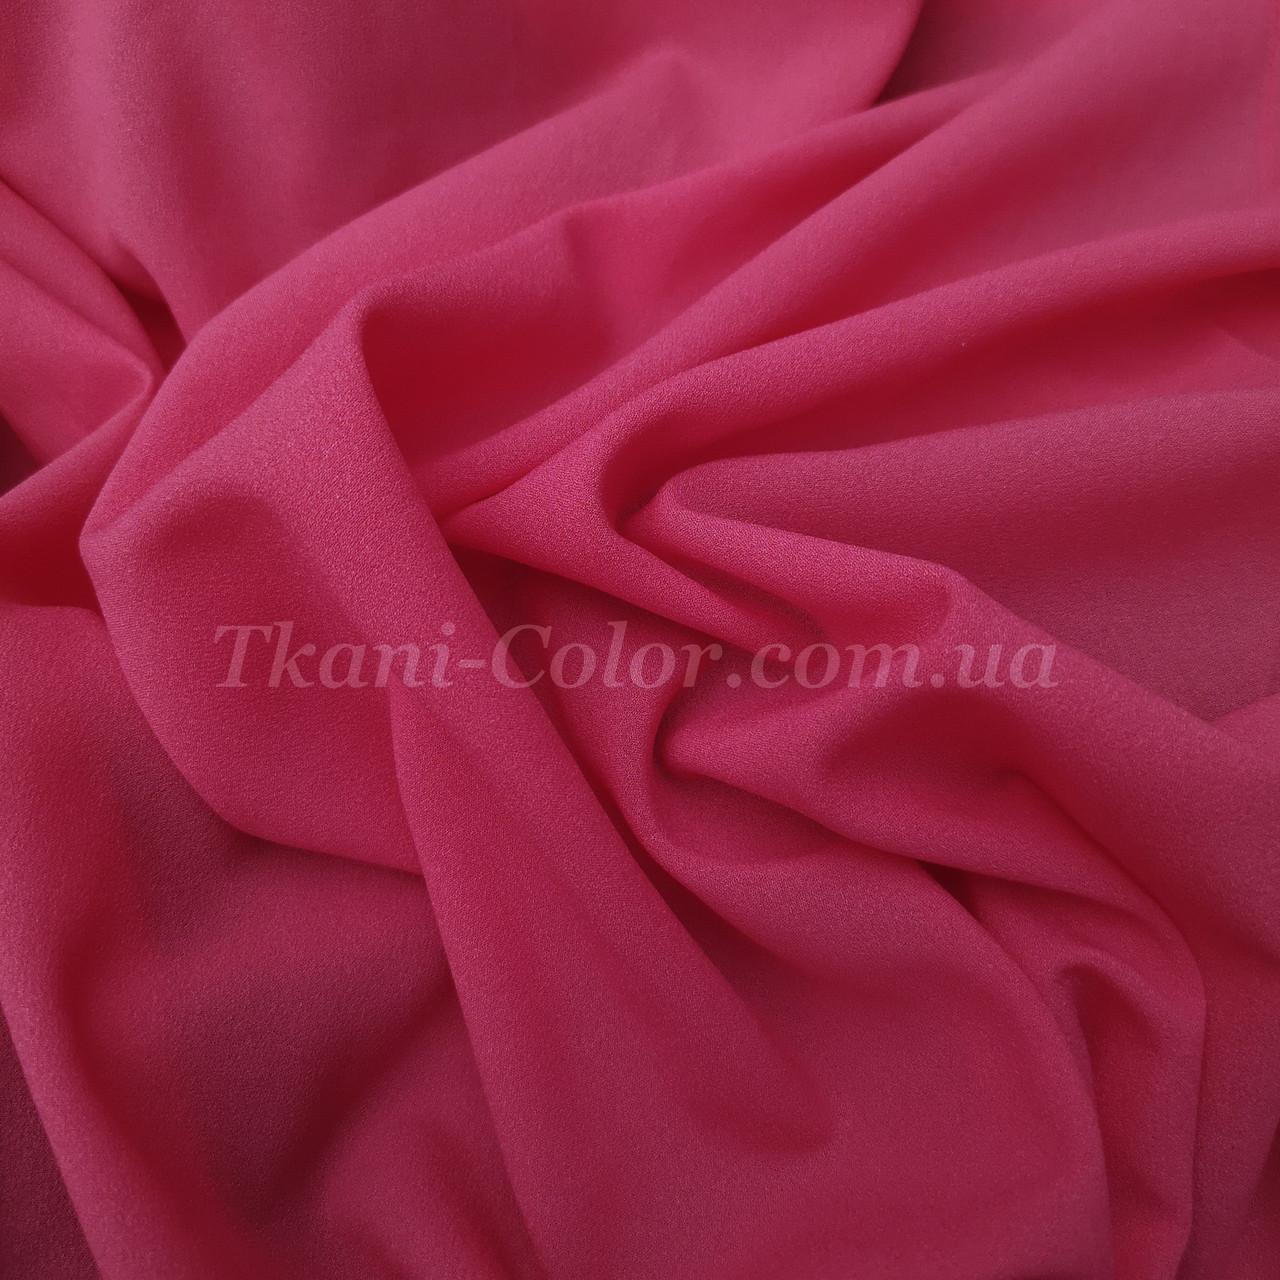 Ткань креп-шифон малиновый